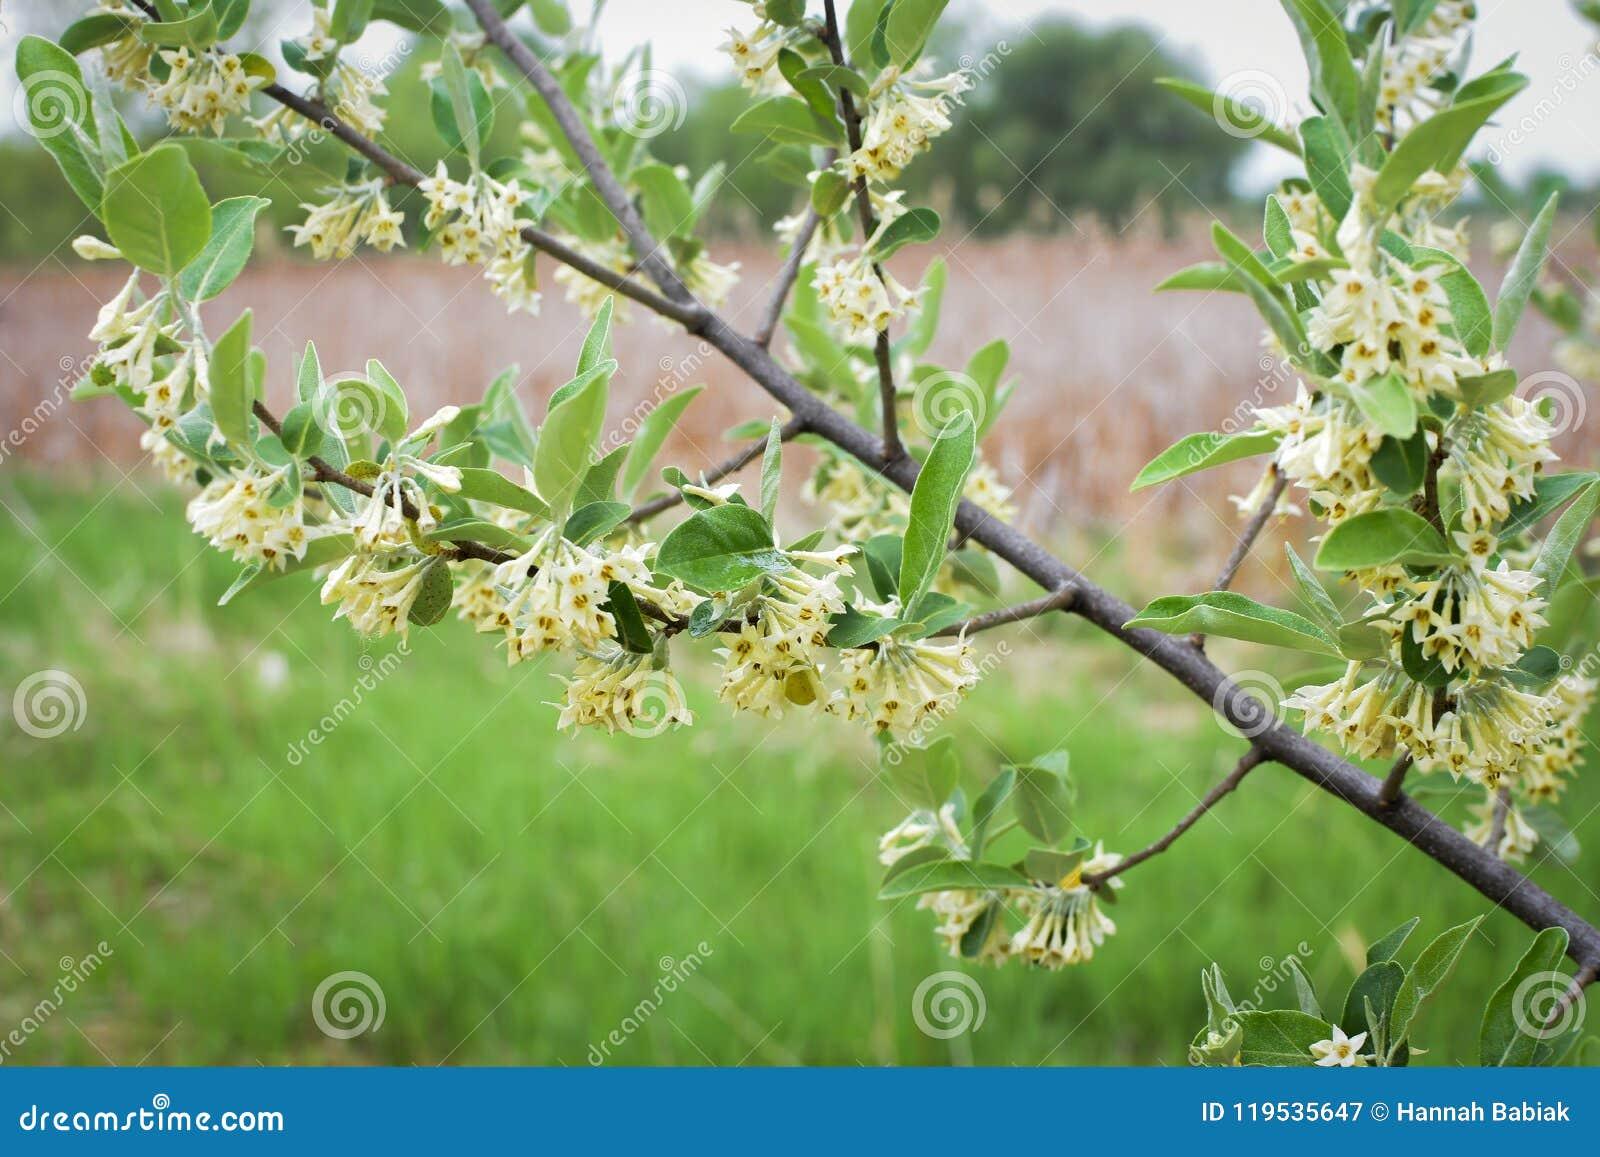 Privet Shrup White Trumpet Flowers Spring Stock Image Image Of